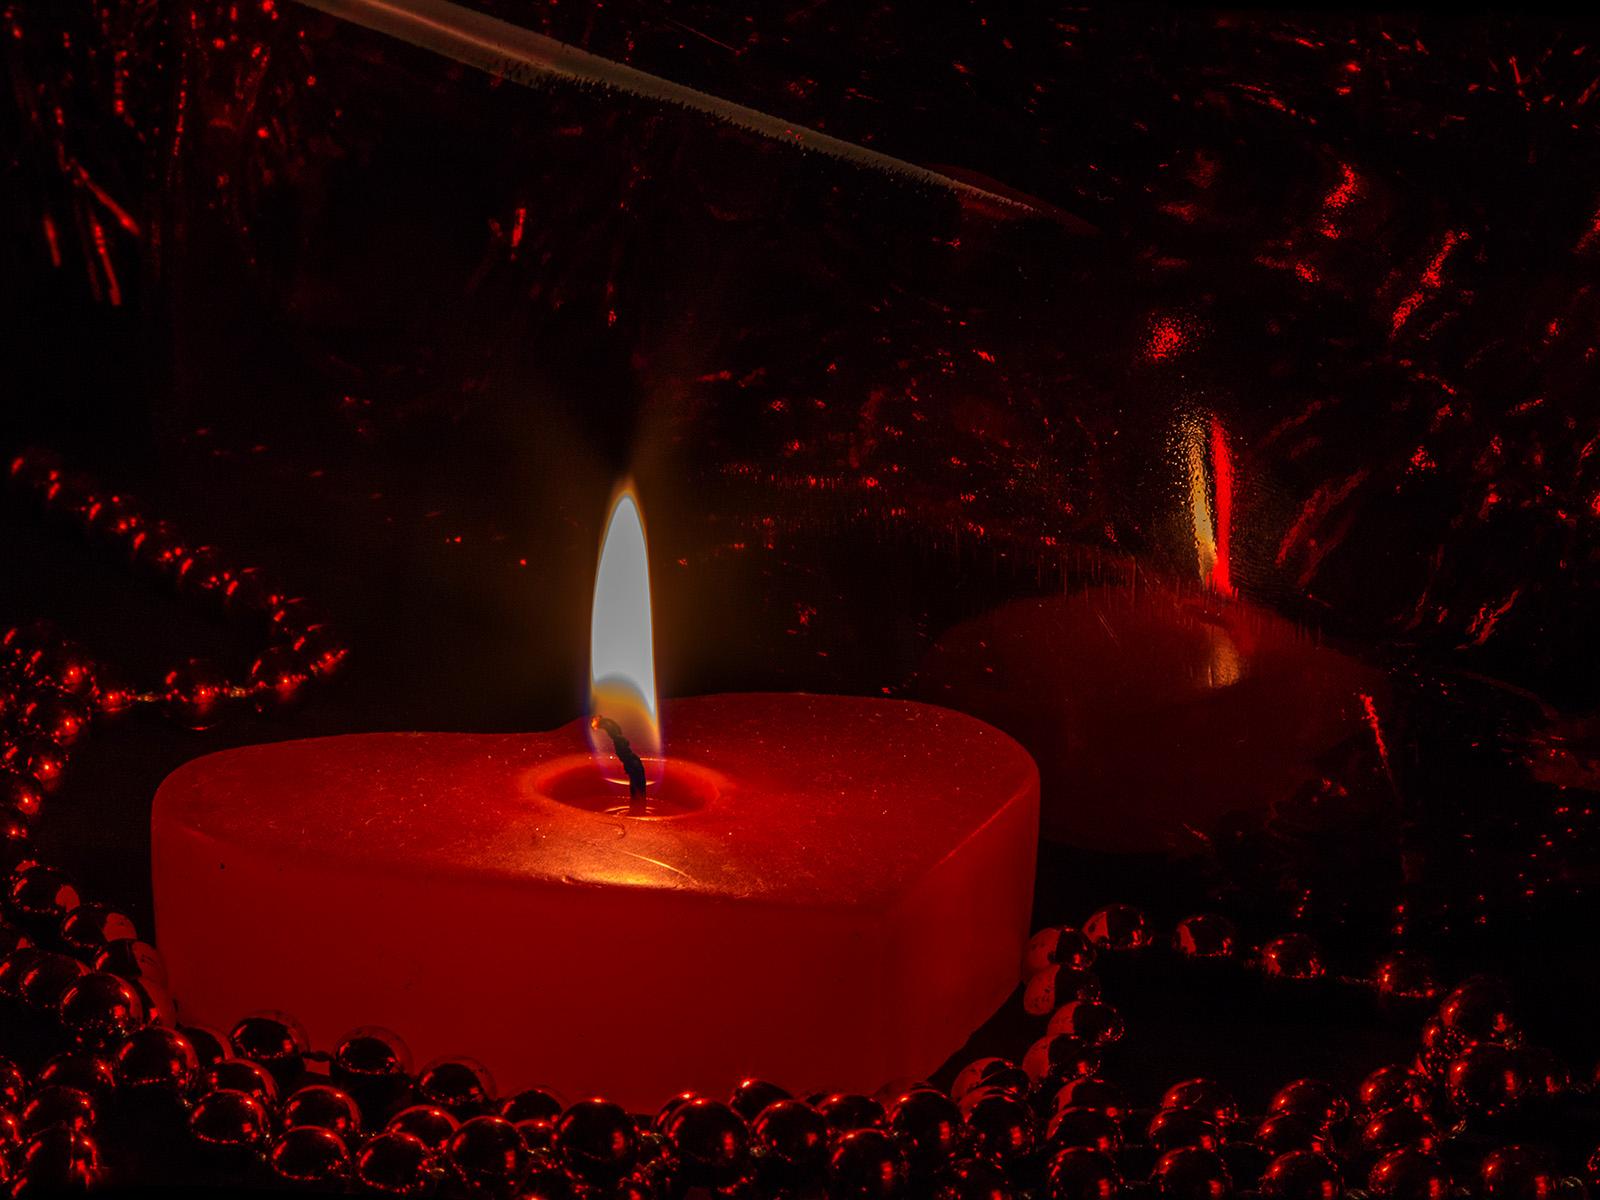 Kerze 105 hintergrundbild - Advent hintergrundbilder ...